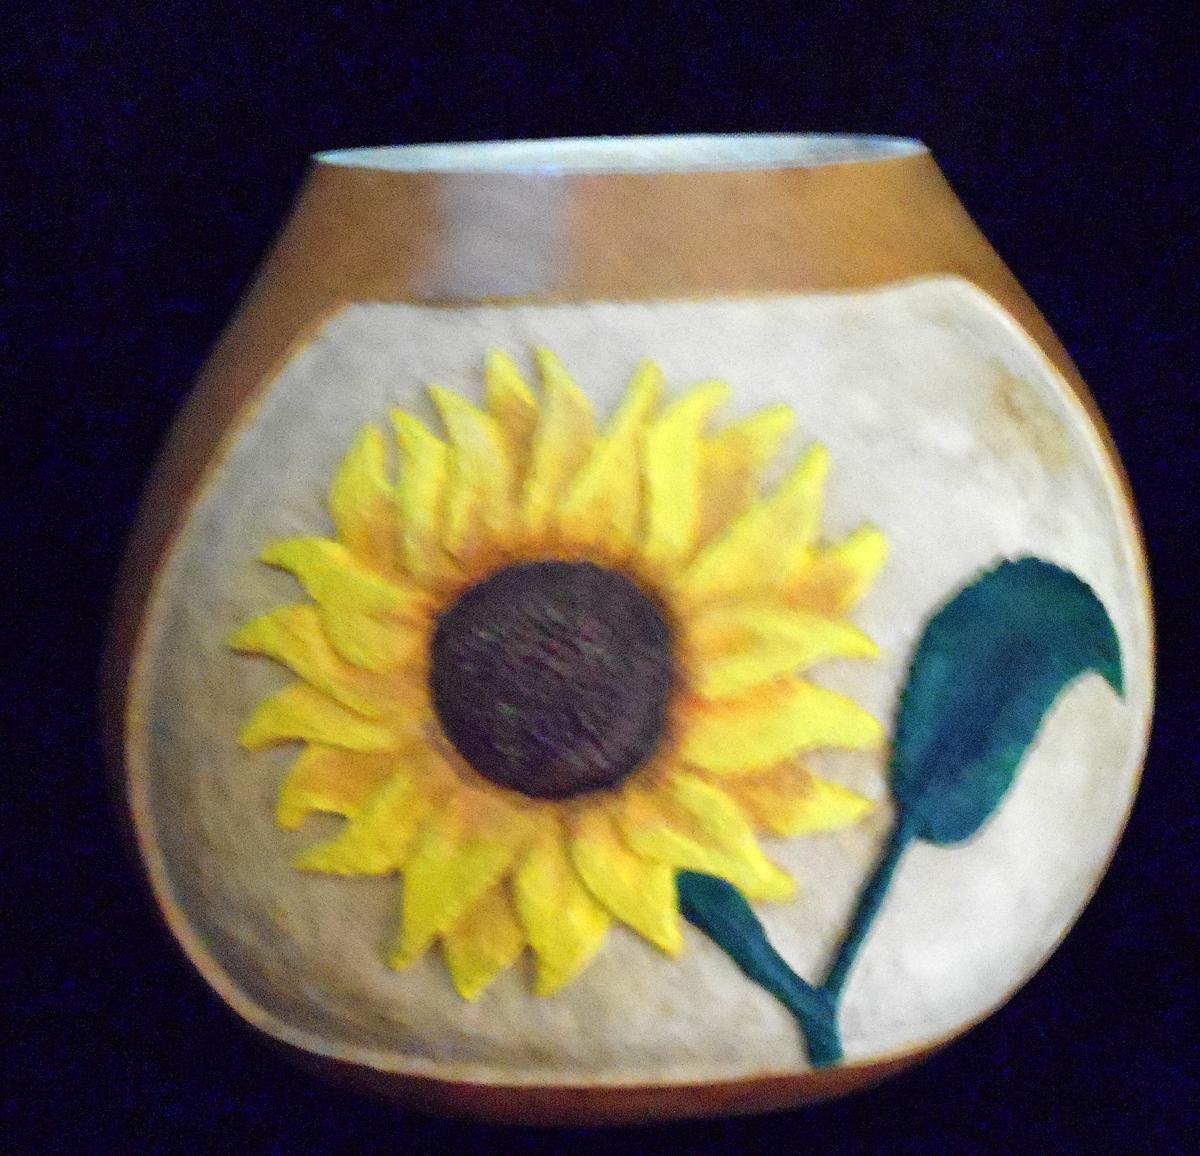 asunflower